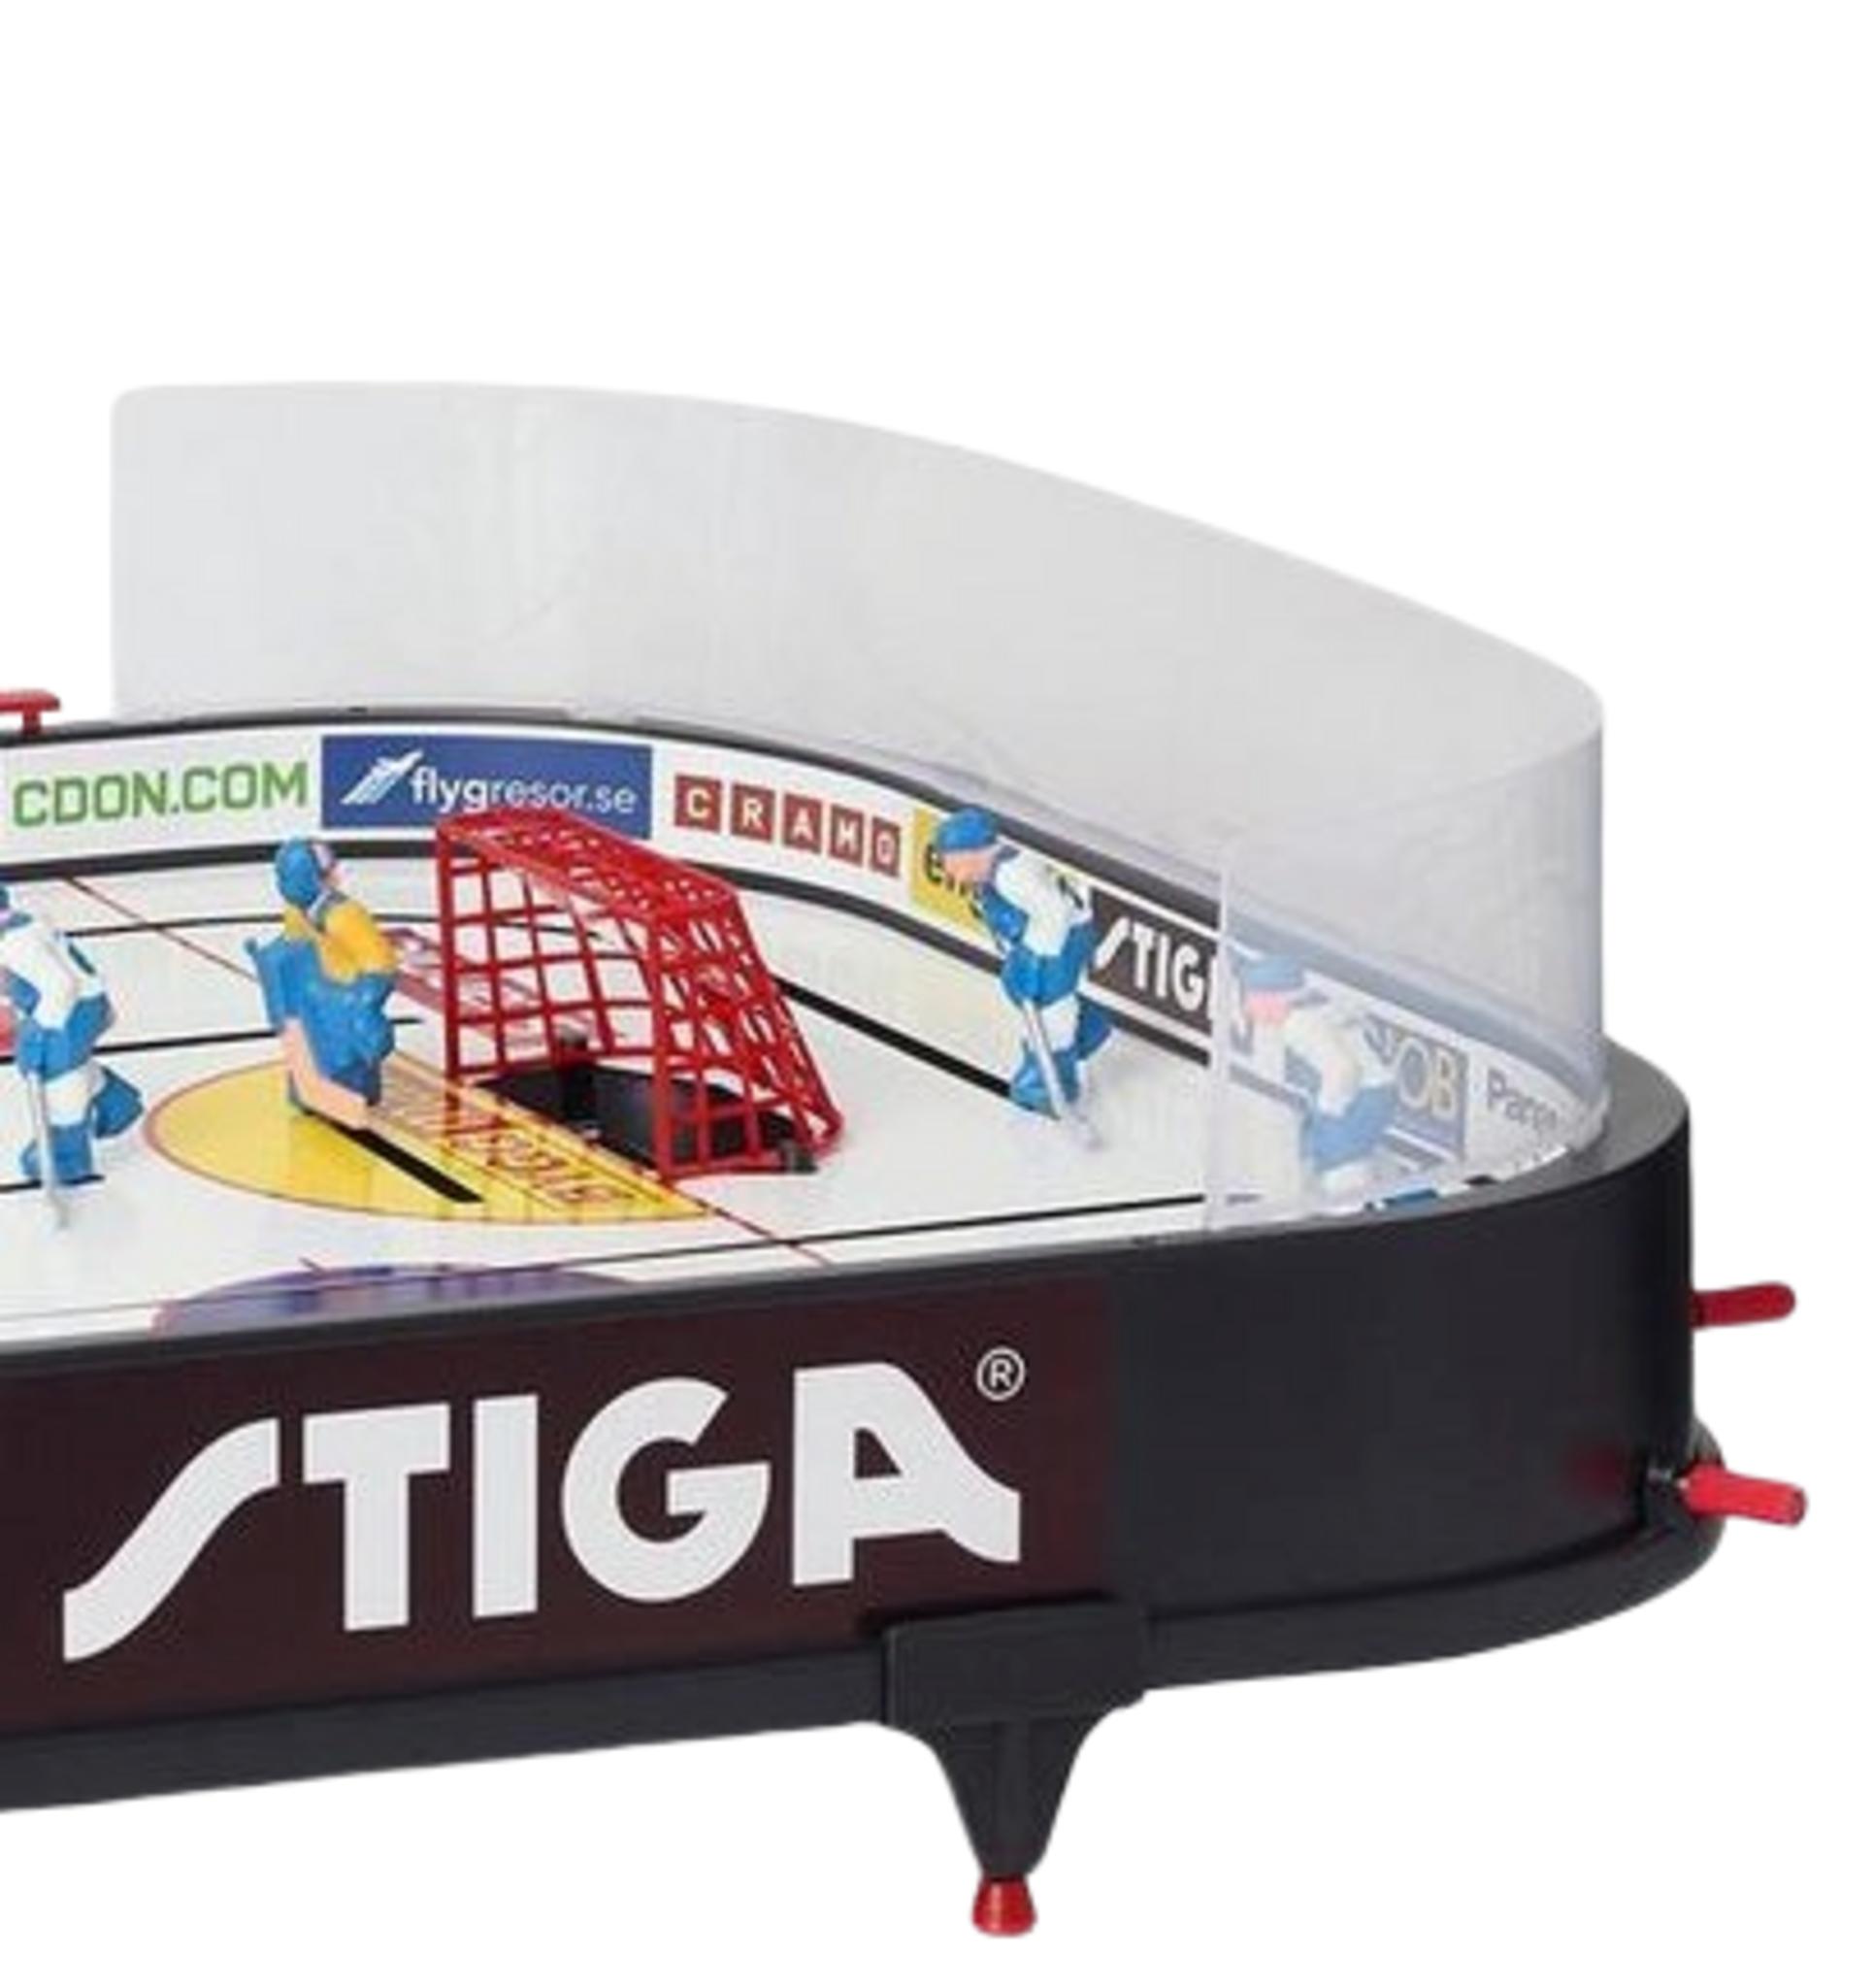 Stiga Pleksiglass bordhockeyspill